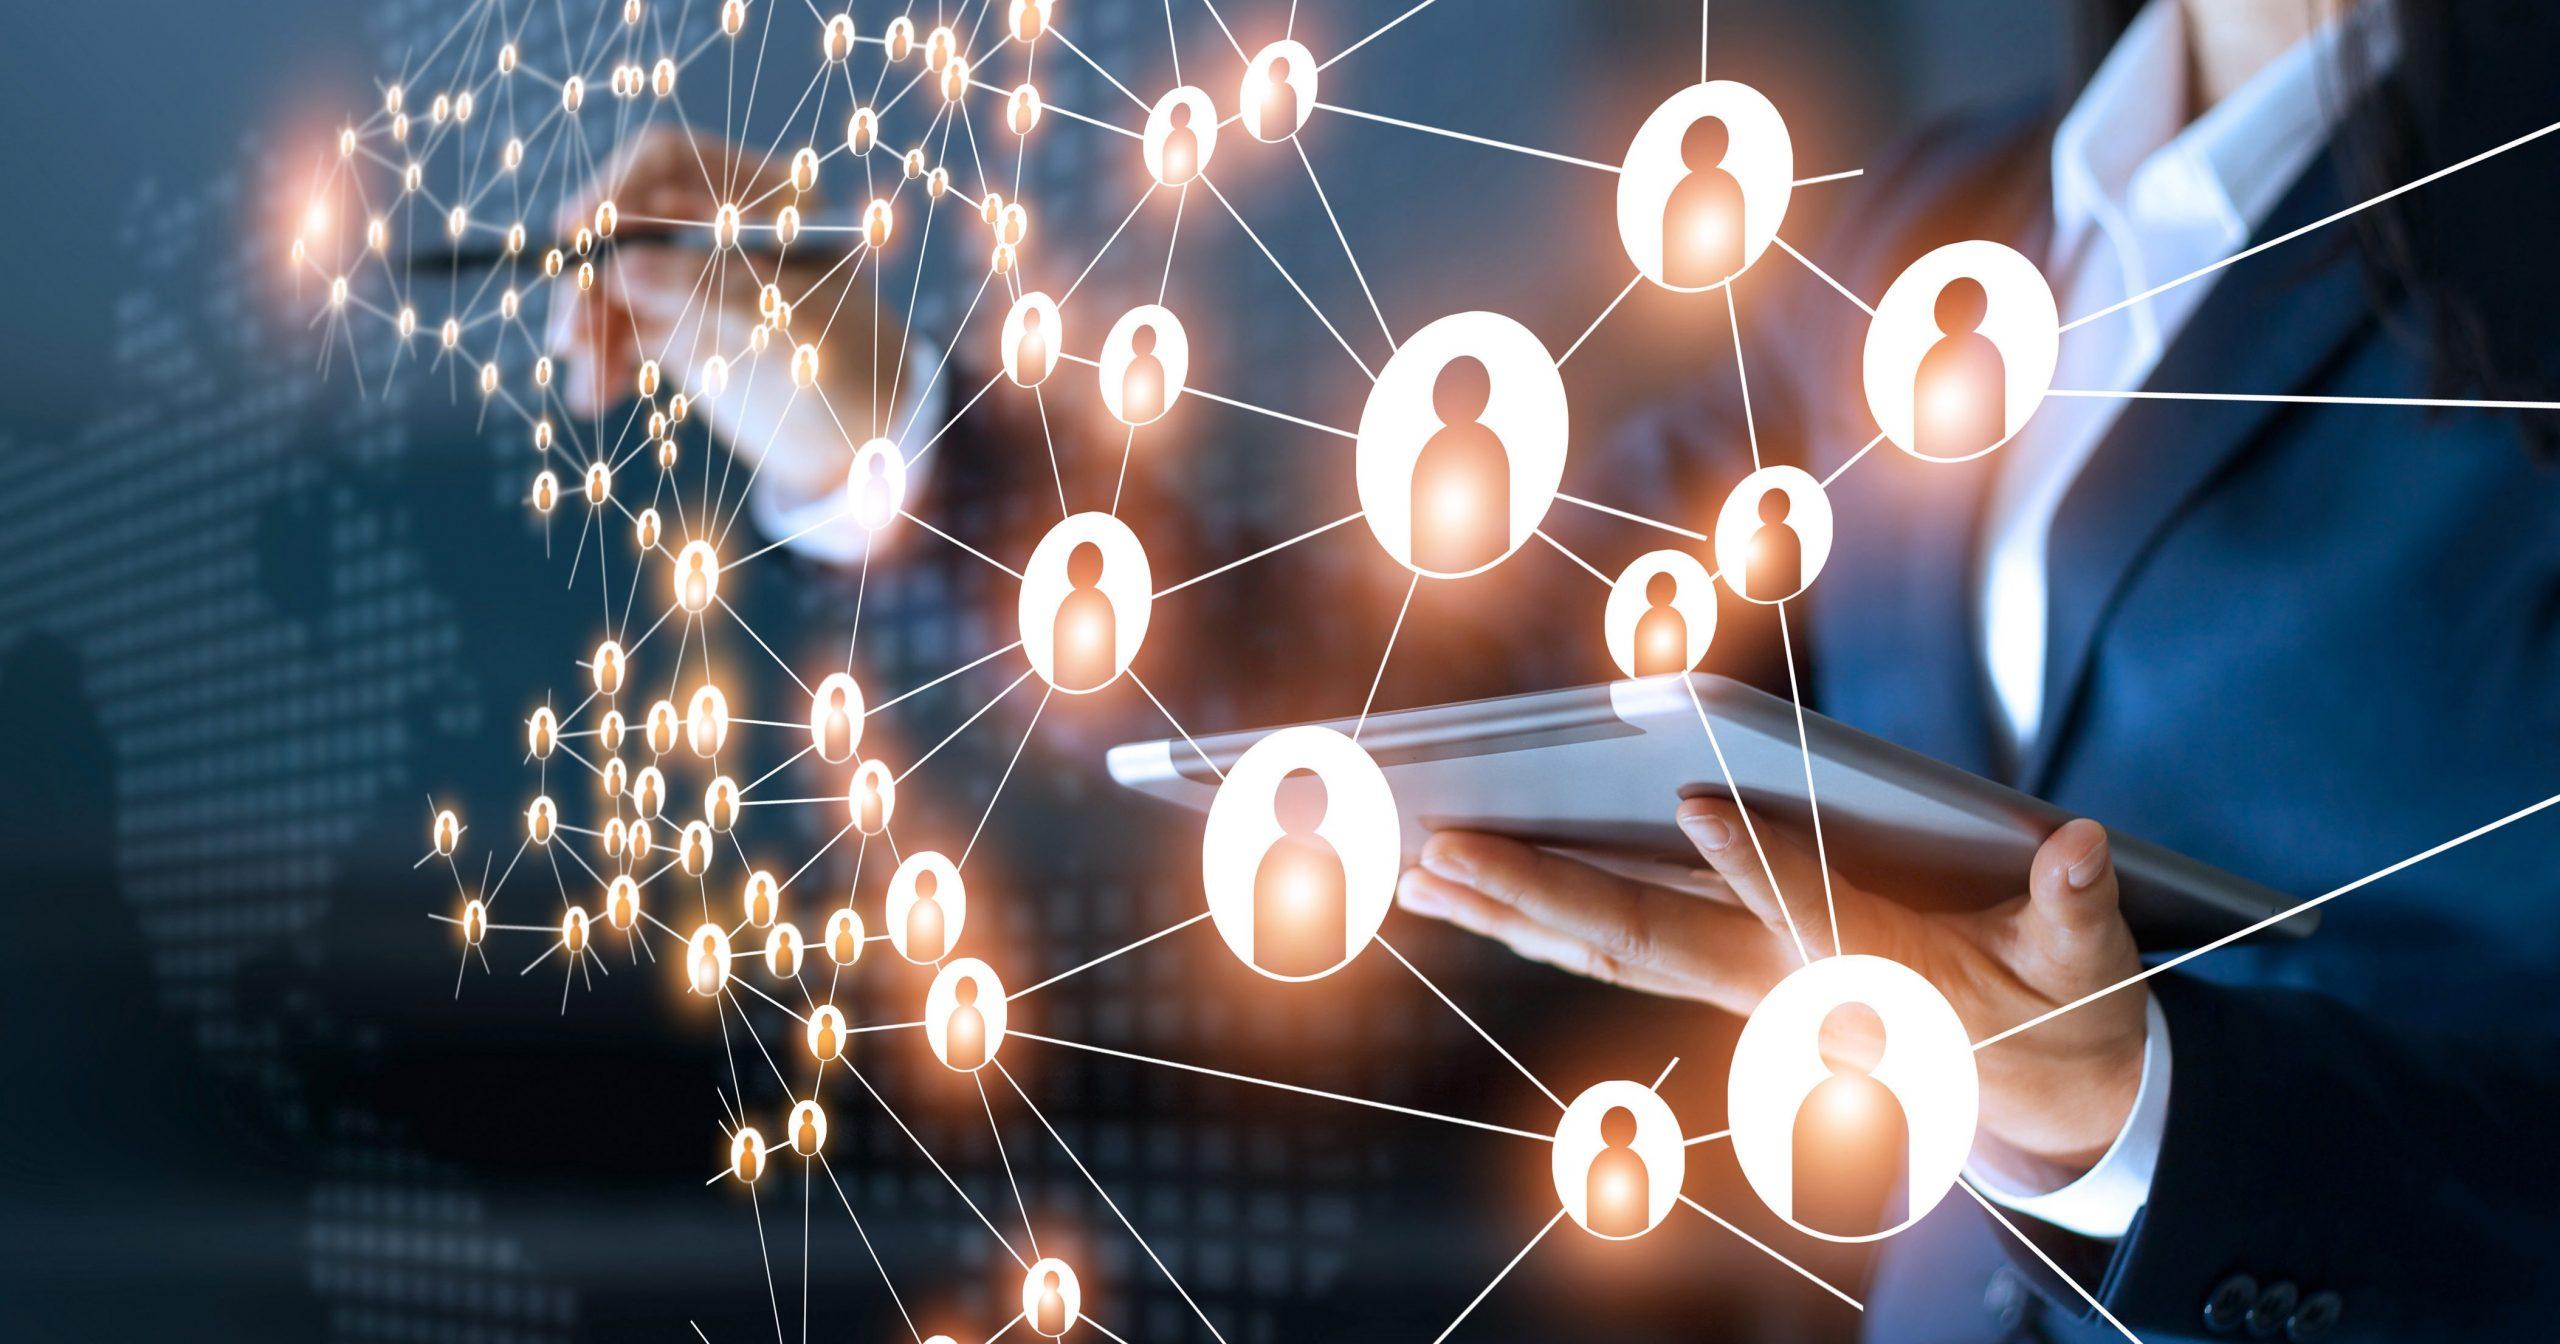 8 proven methods will skyrocket your website user engagement